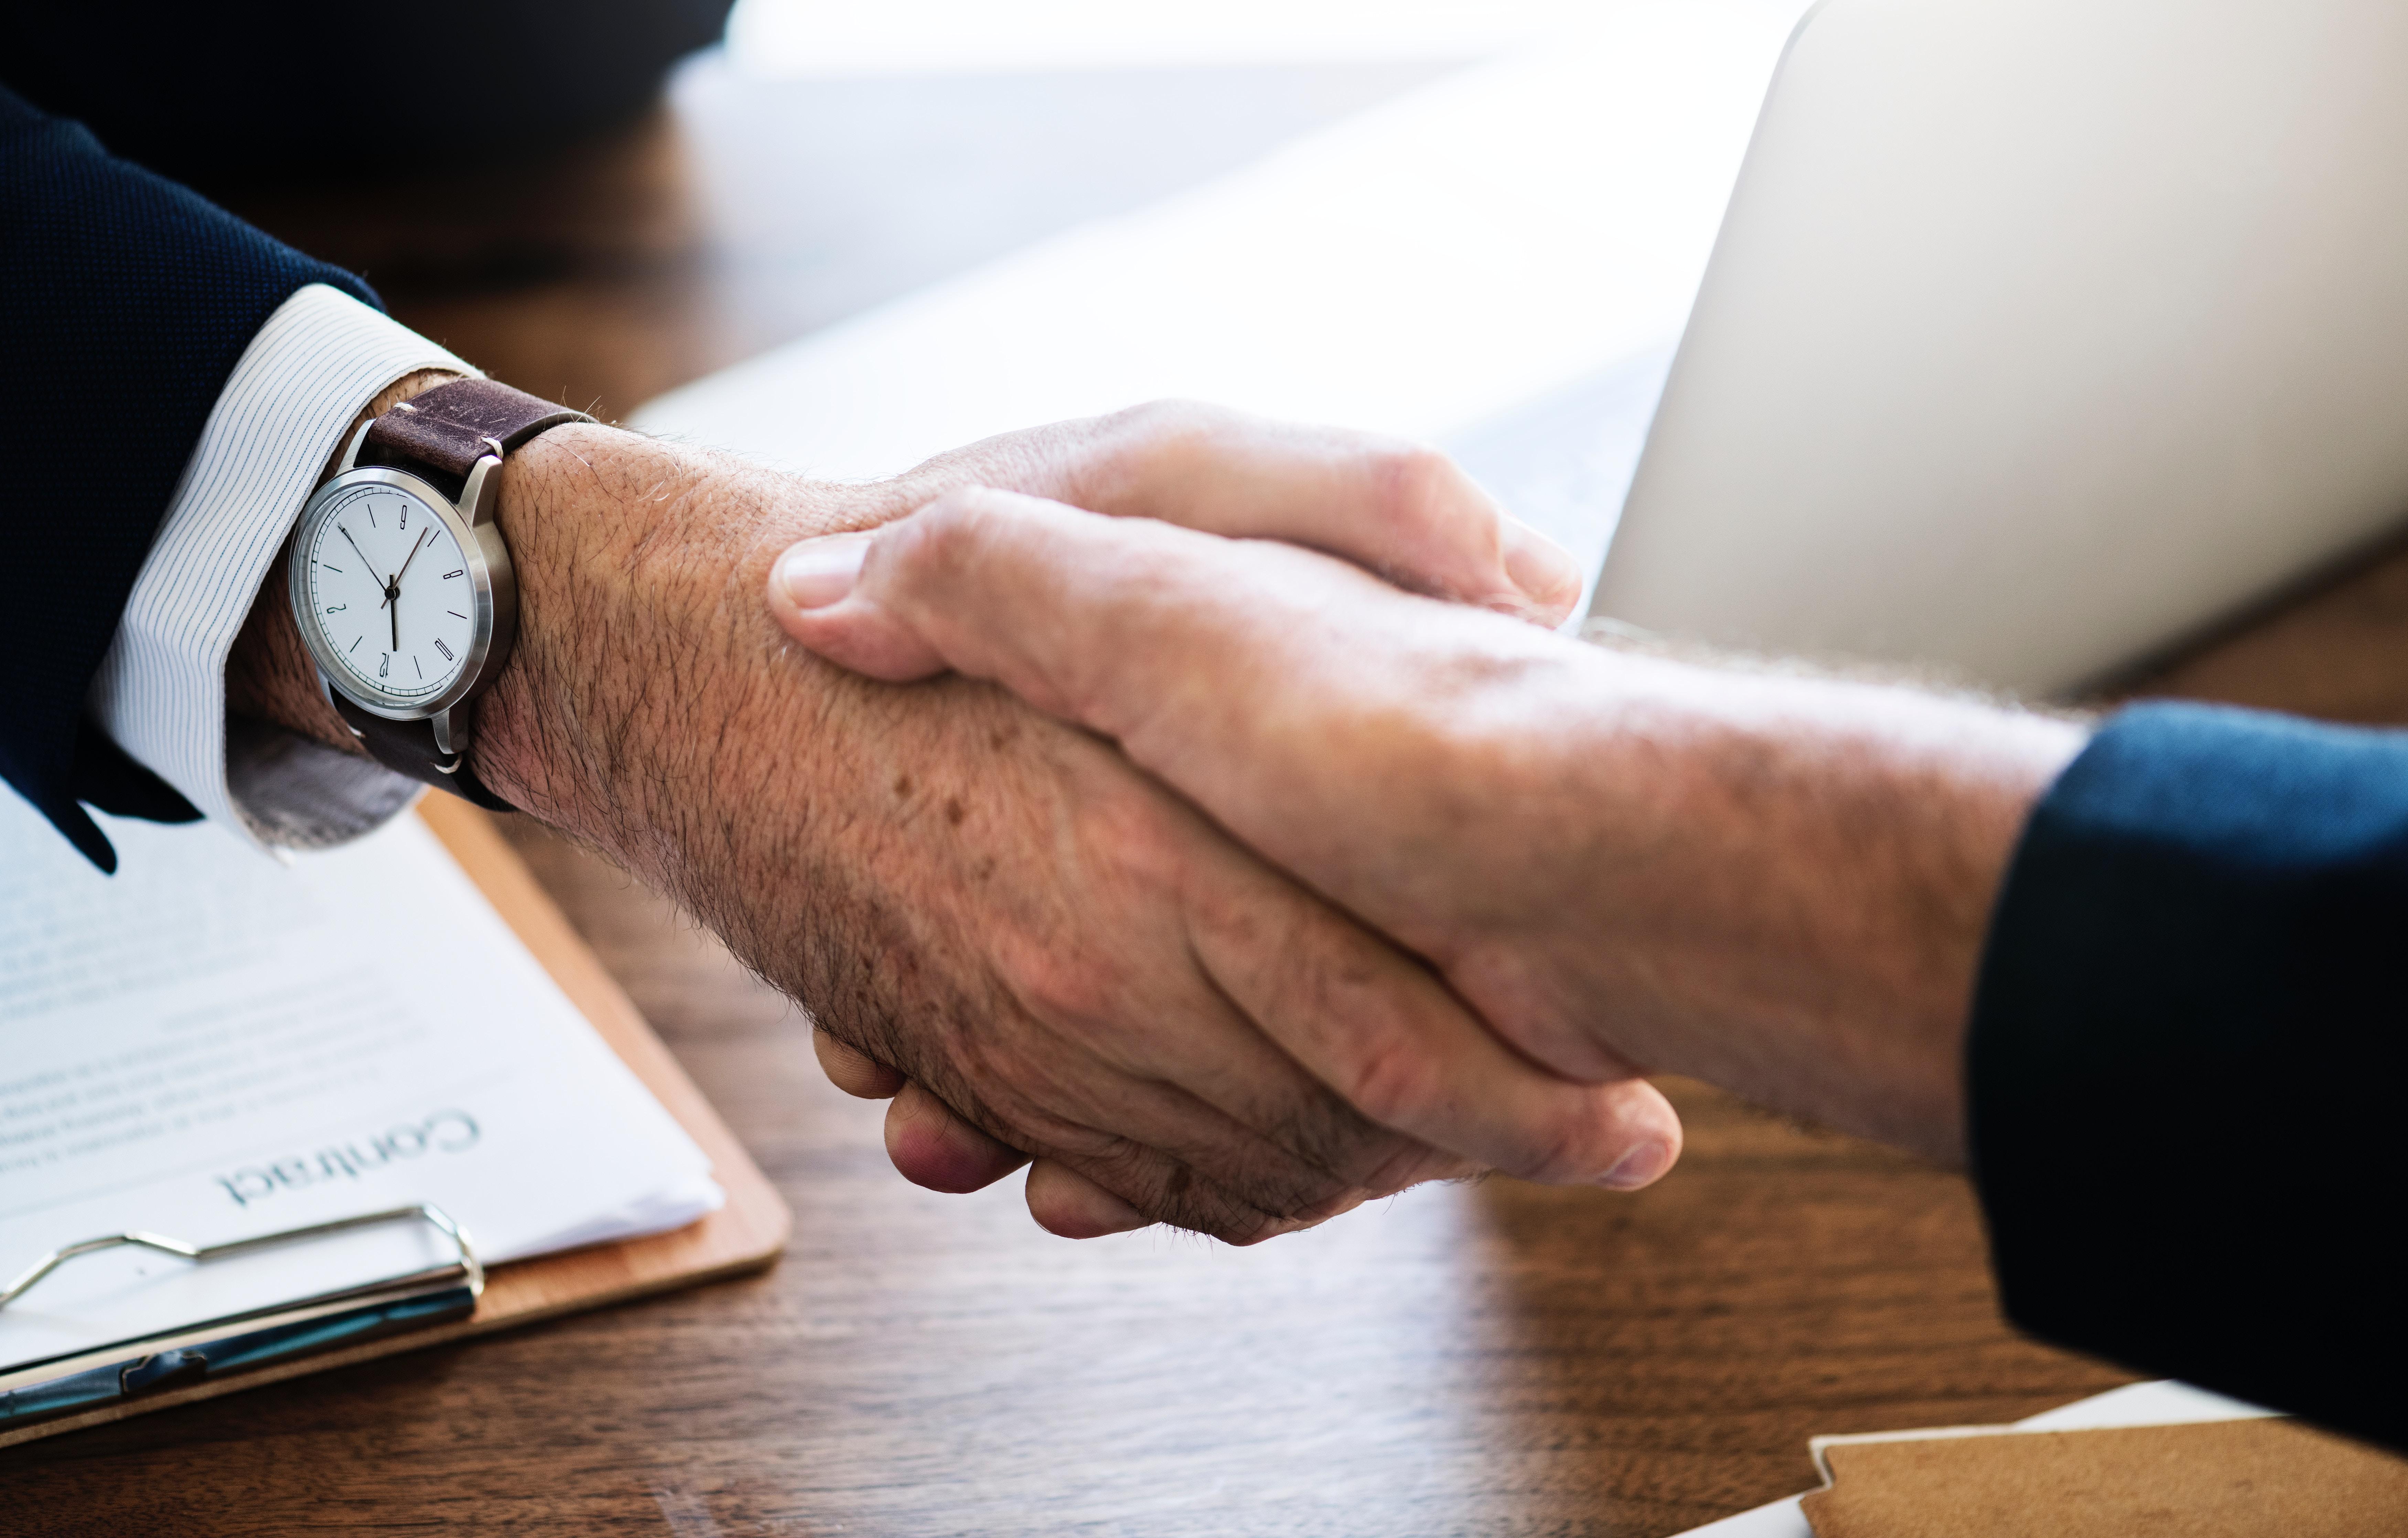 handshake for a job offer agreement